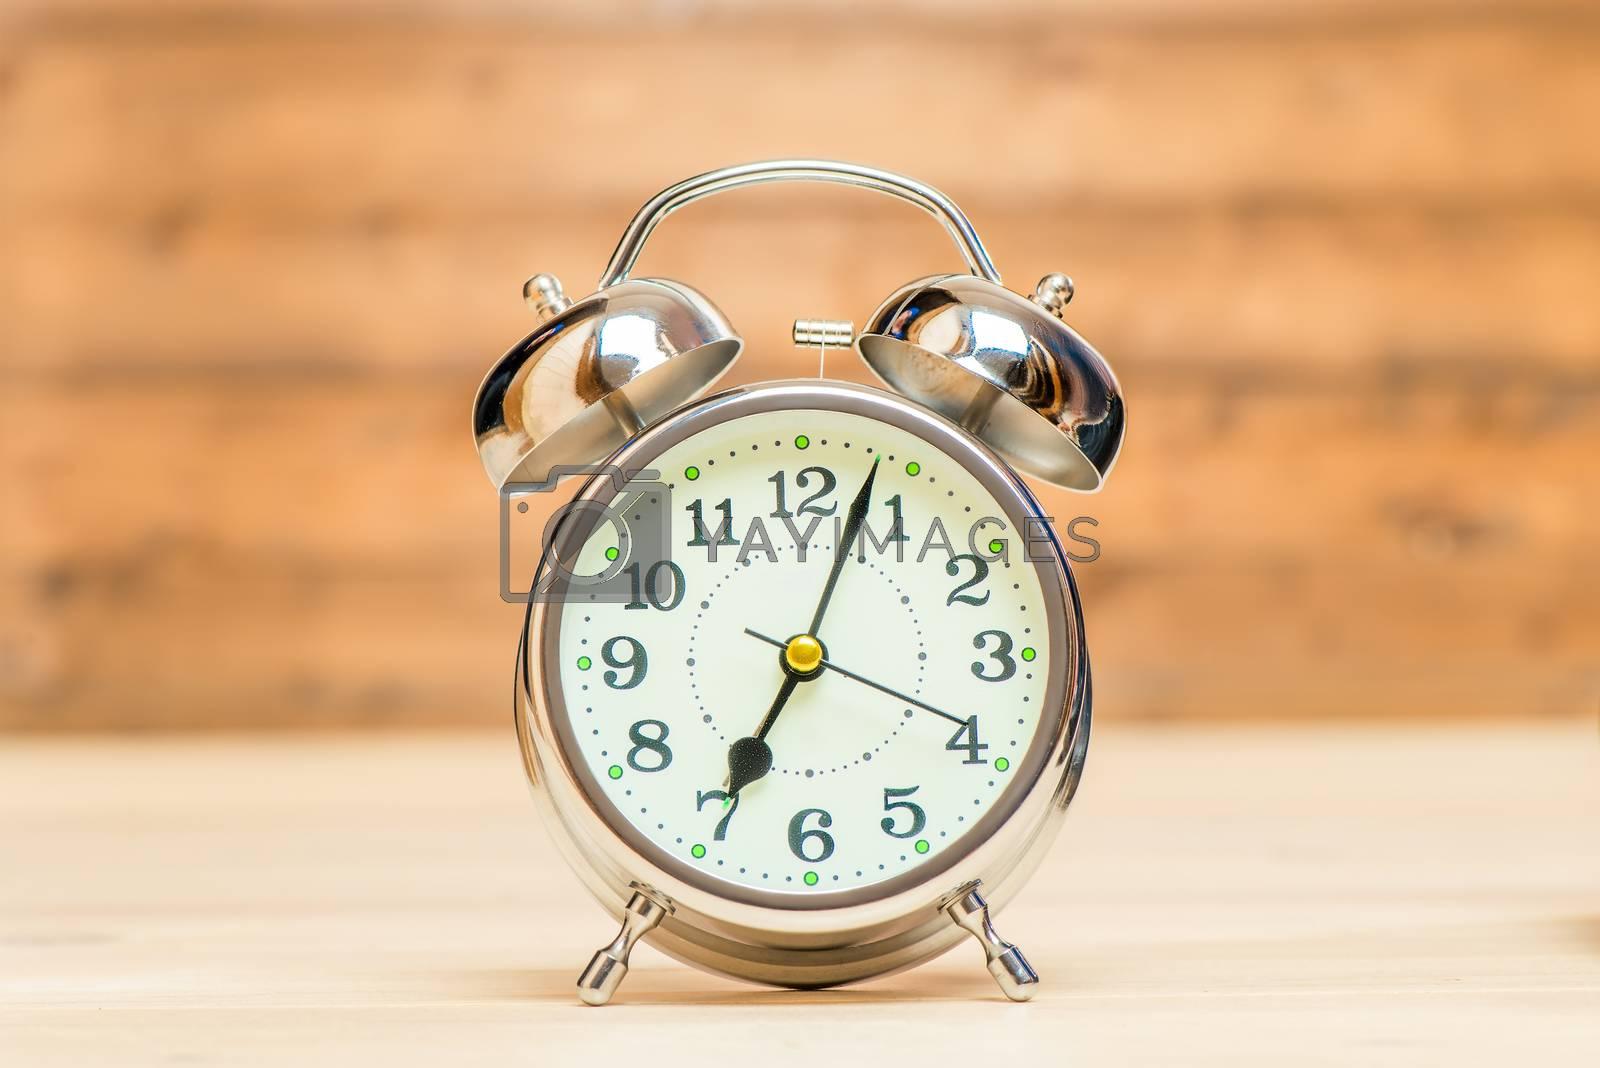 Silver alarm clock in retro style on a wooden background close-u by Labunskiy K.